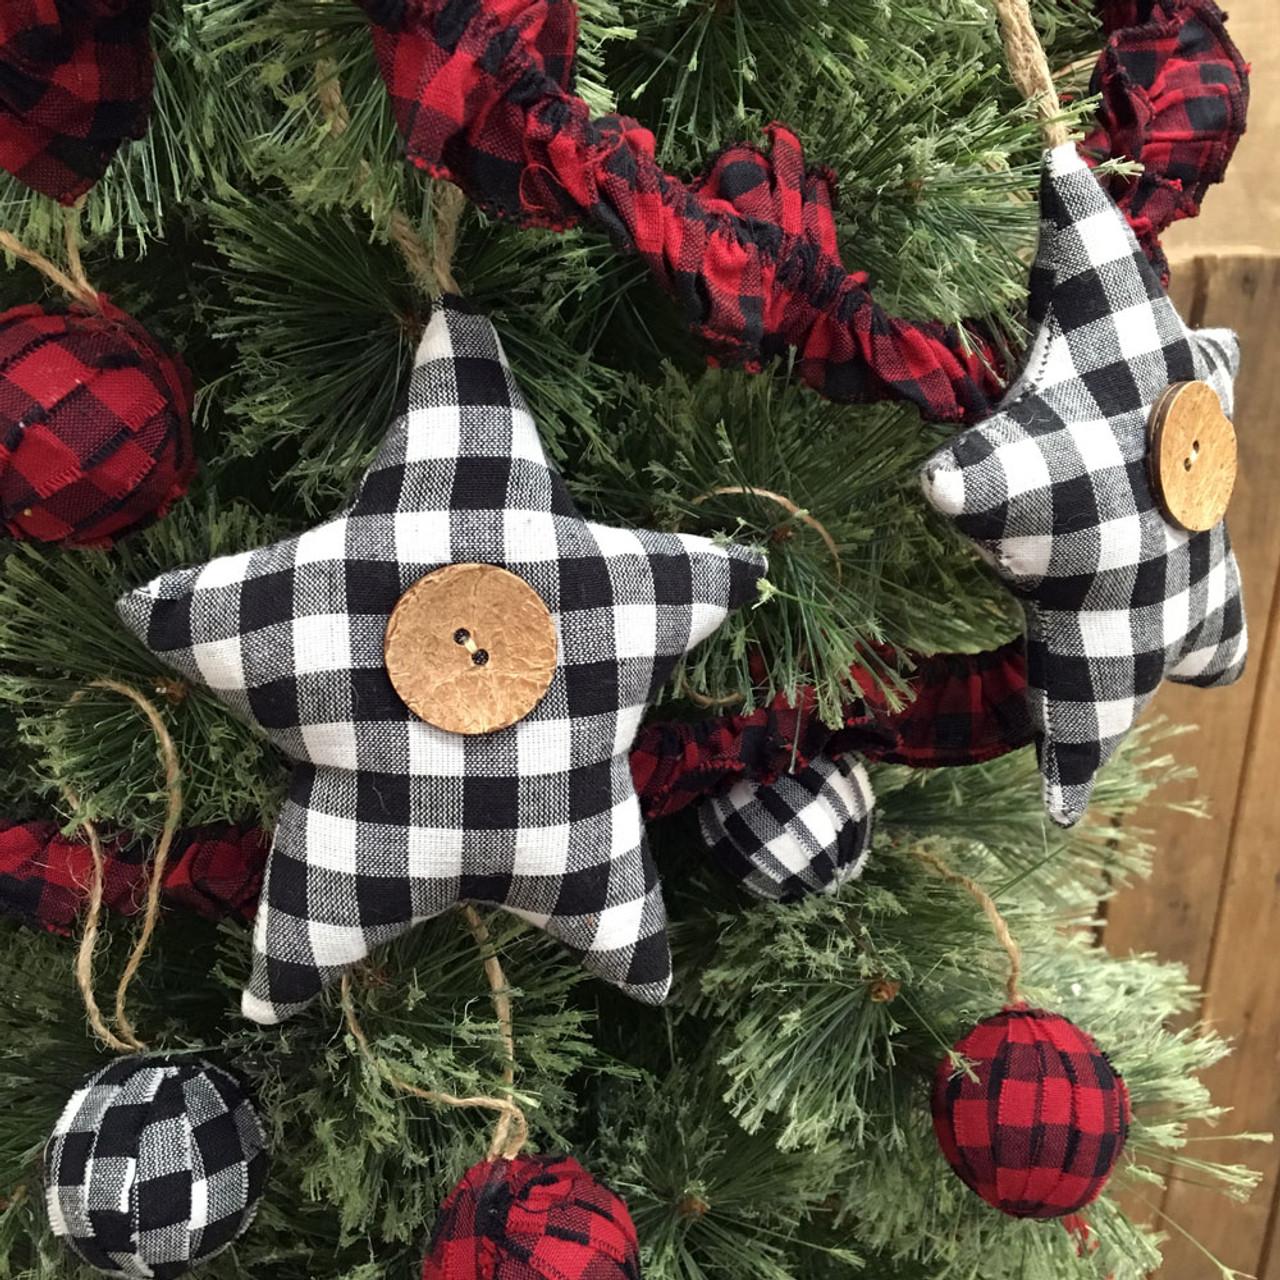 Christmas Ornaments Christmas Tree Ornaments Christmas Buffalo Check Ornament. Christmas Farmhouse Ornaments Fabric Christmas Ornaments